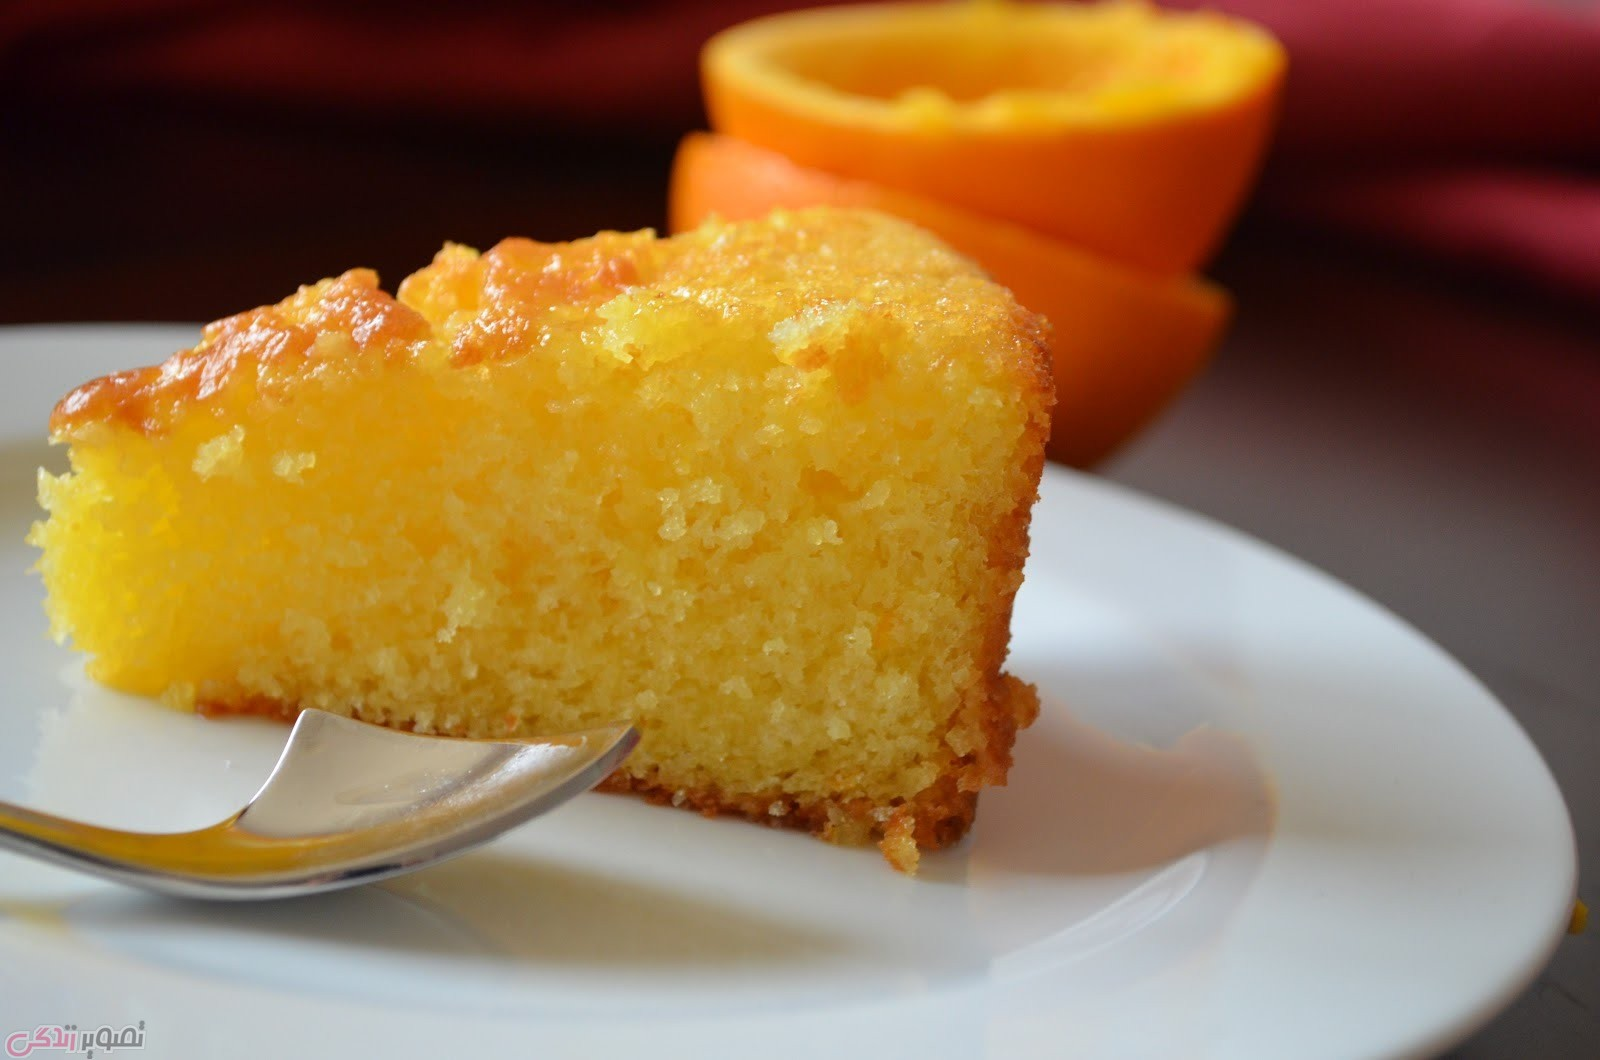 کیک پرتقالی,کیک تولد,کیک خانگی